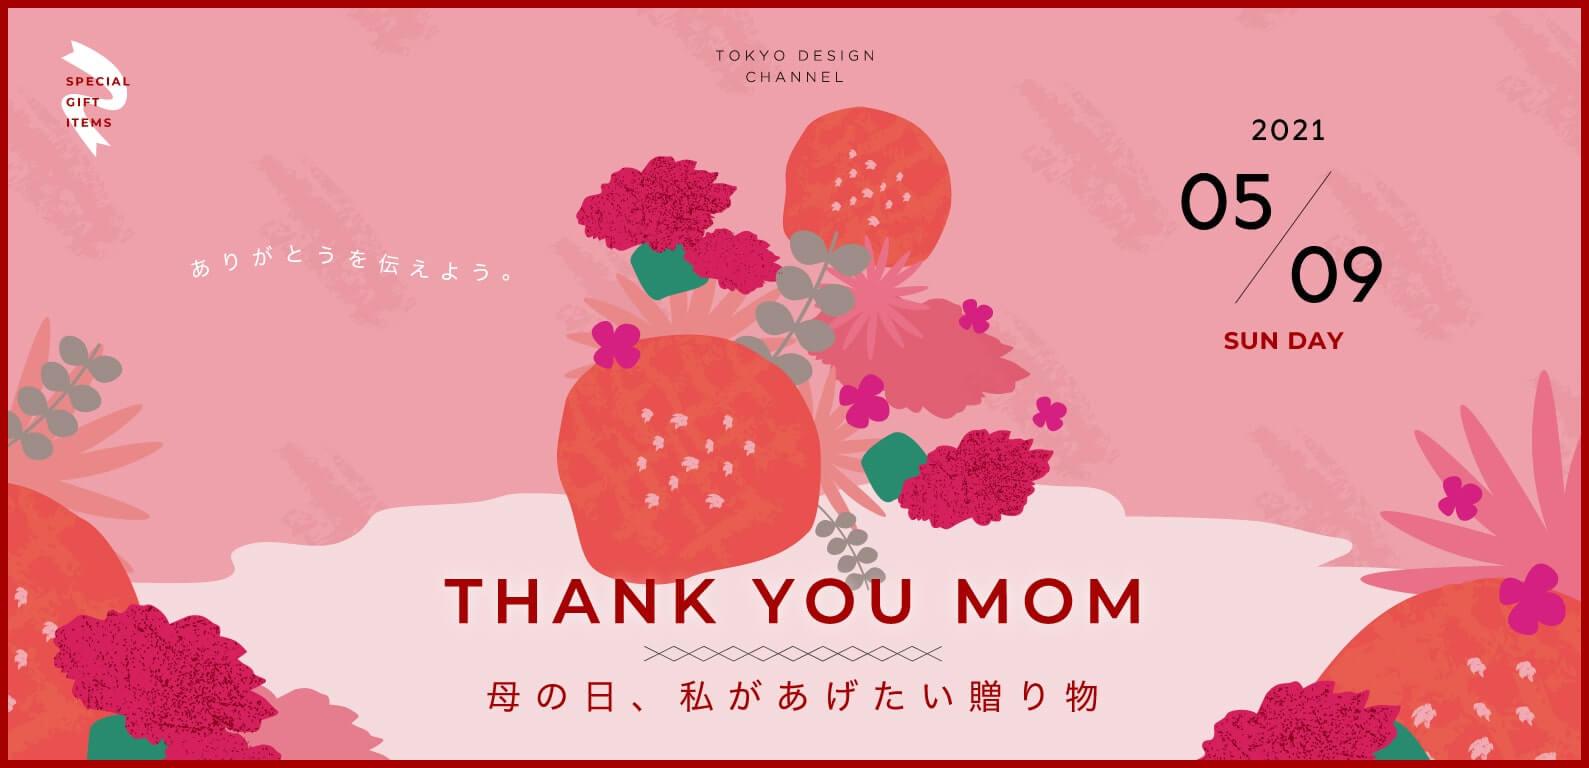 TDC THANK YOU MOM 母の日、私があげたい贈り物